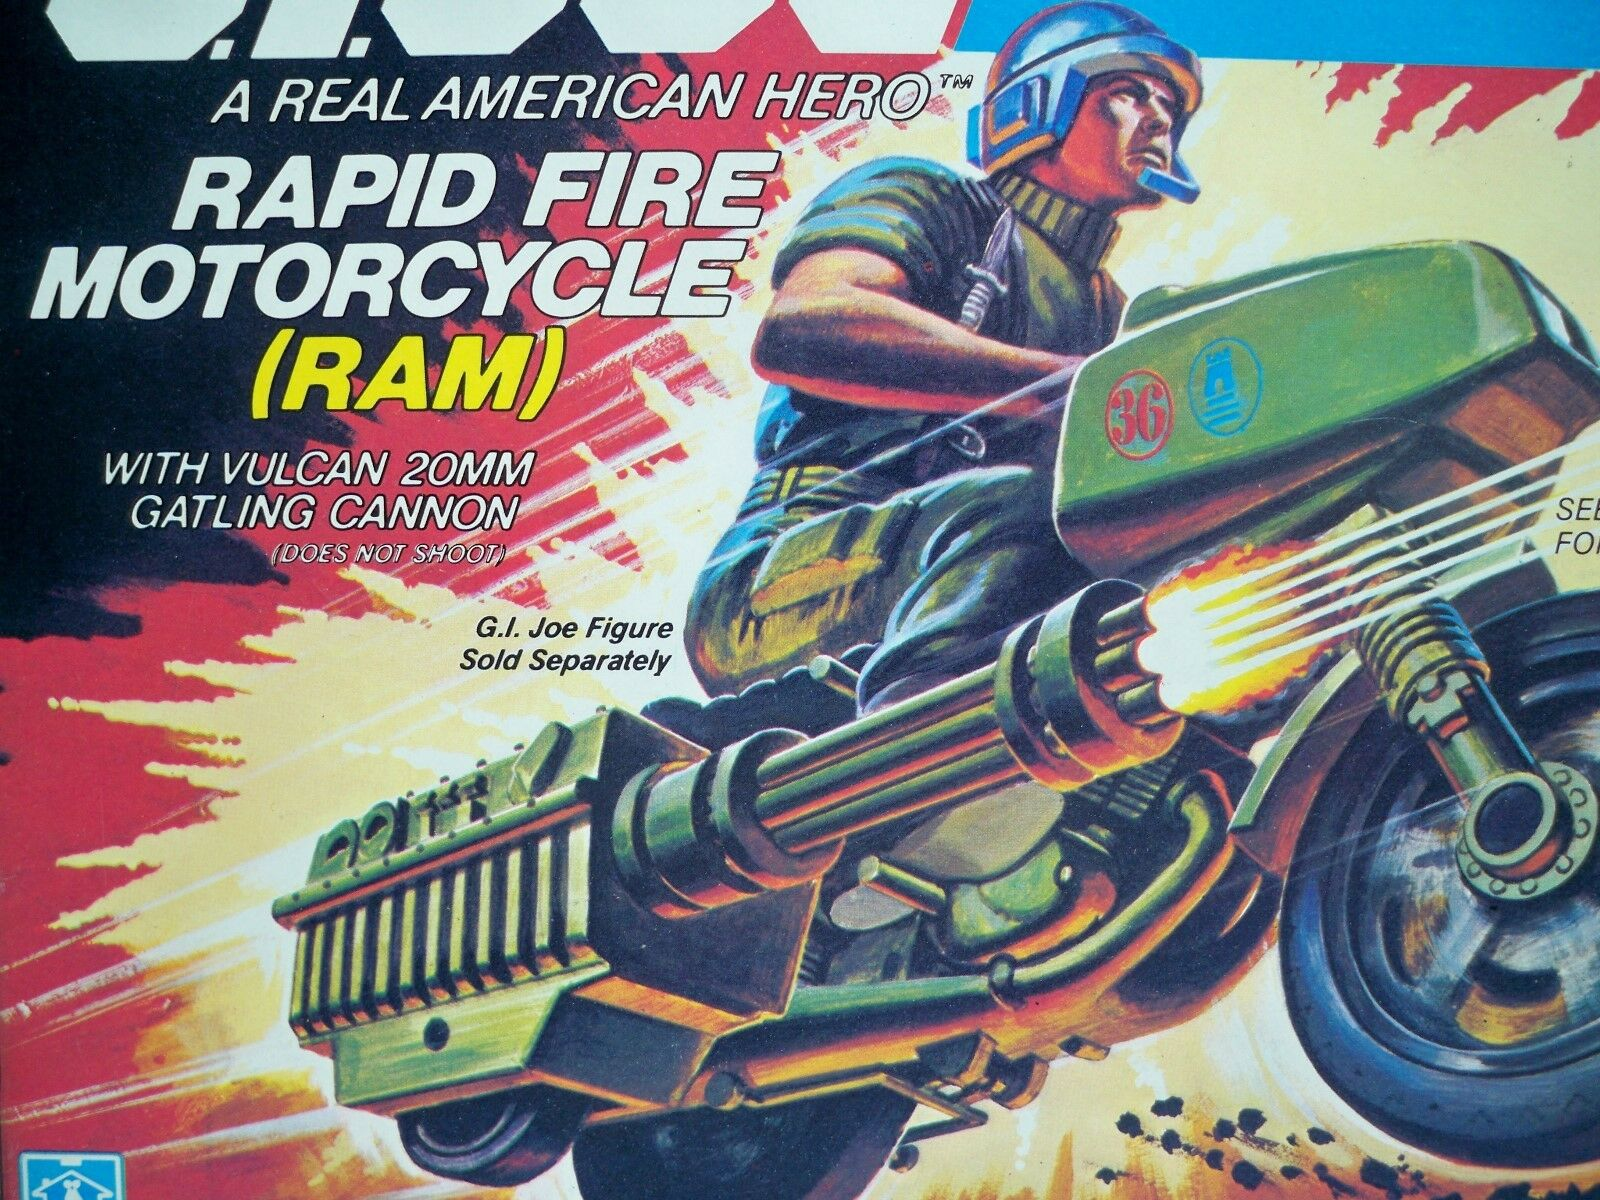 K1877961 RAM RAPID FIRE MOTORCYCLE MIB MINT IN  scatola 1982 GI JOE VINTAGE ORIGINAL  distribuzione globale